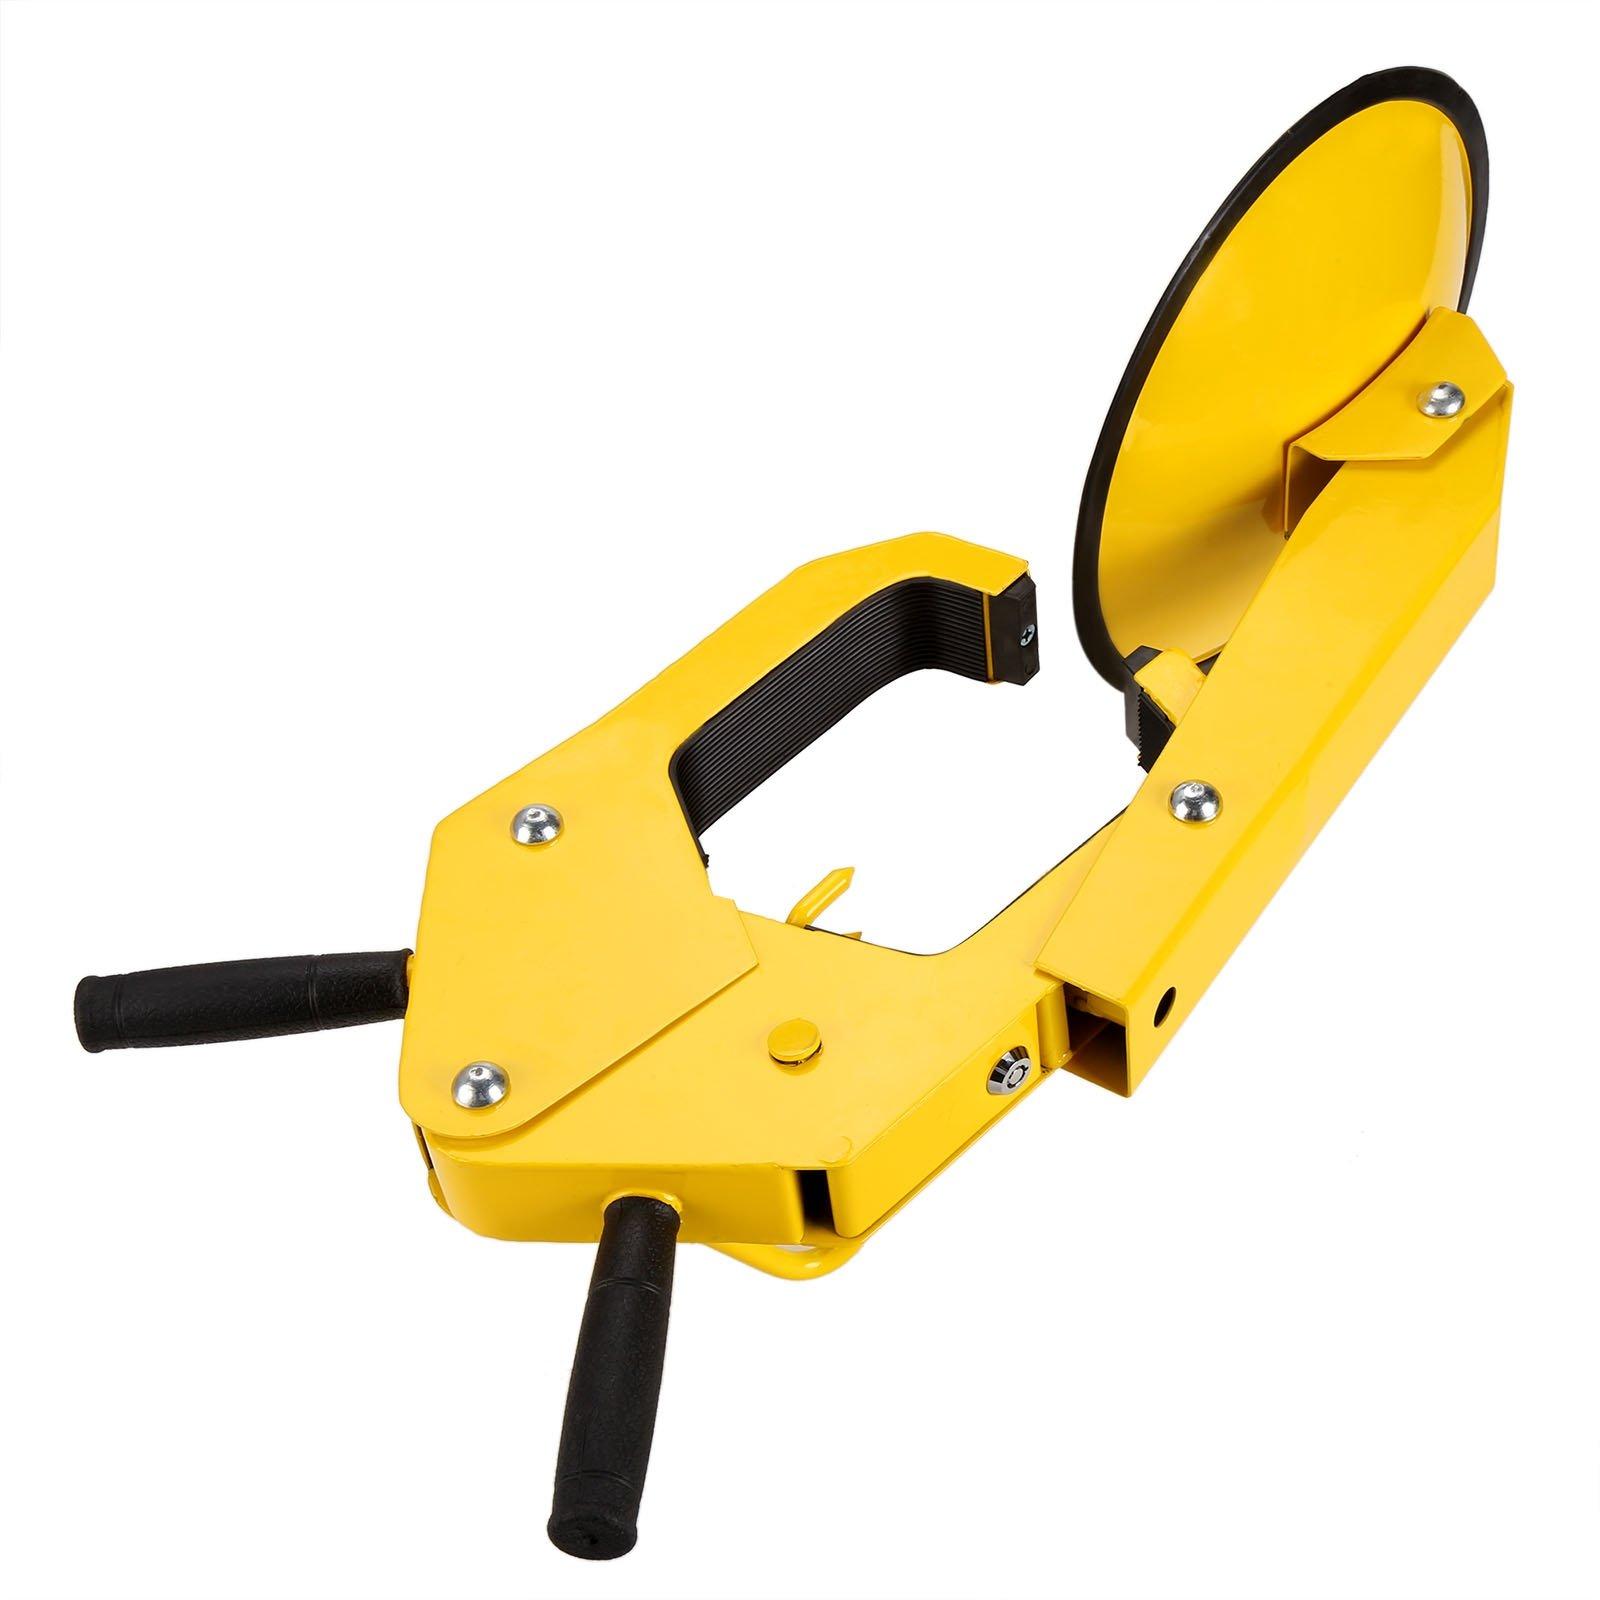 Hindom Hindom Wheel Lock Clamp Boot Safety Heavy Duty Tire Claw Auto Car Anti Theft Lock (Yellow US Stock)